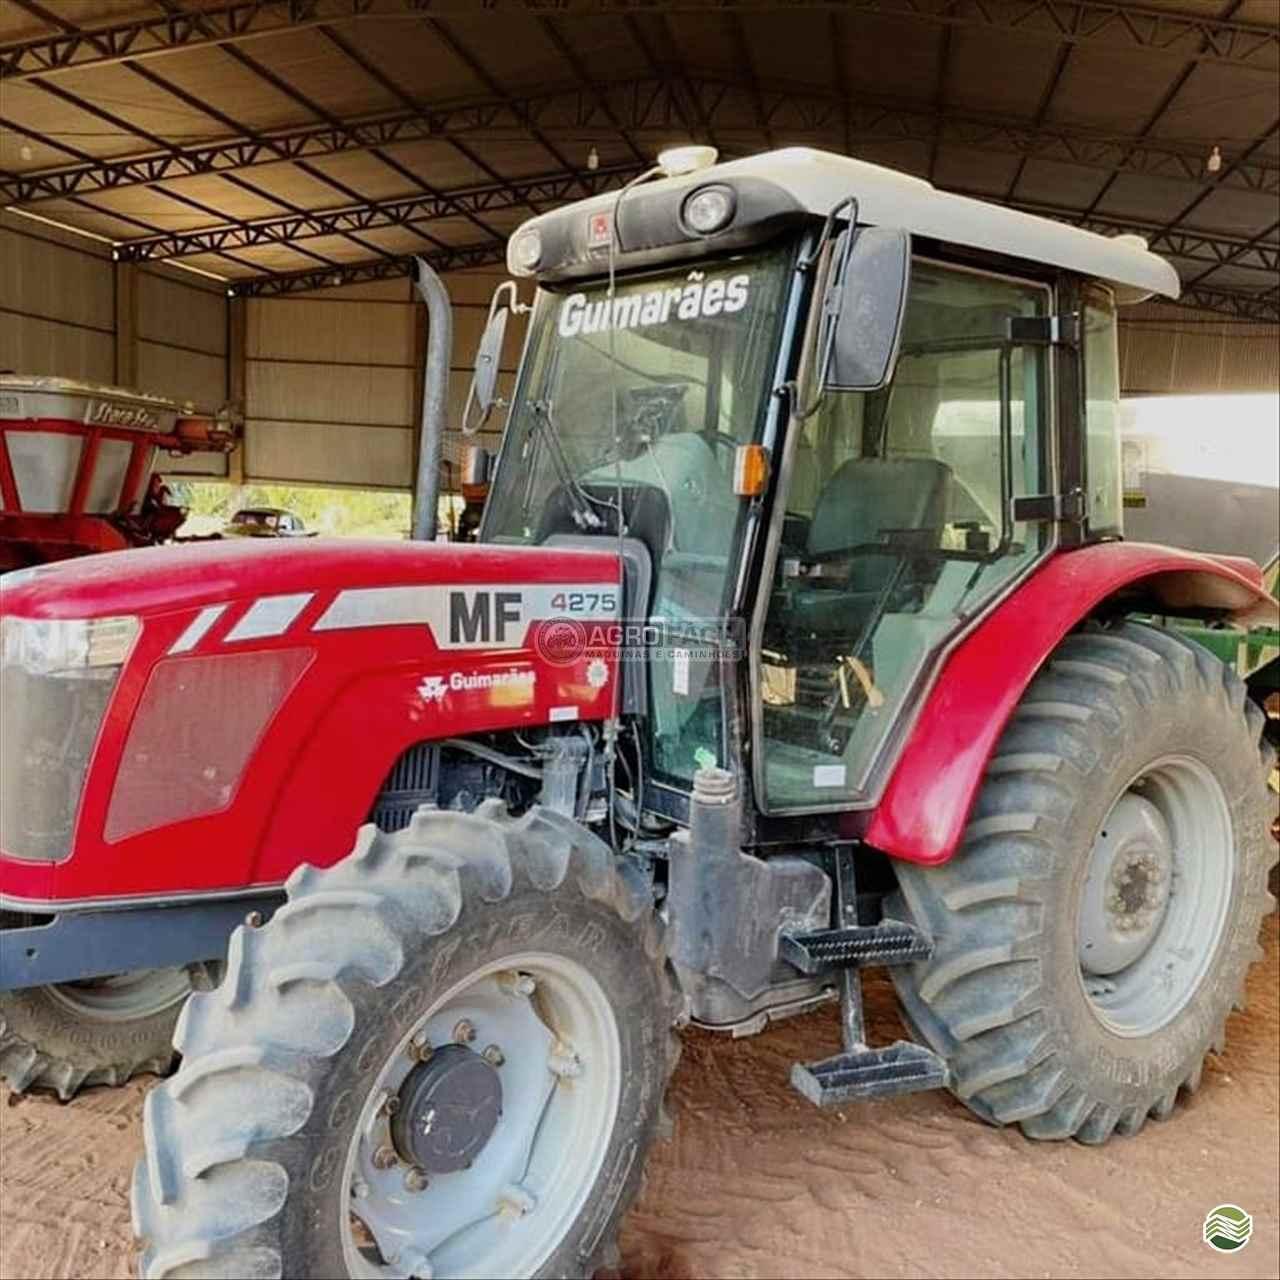 MF 4275 de Agro Fácil Máquinas - PRIMAVERA DO LESTE/MT